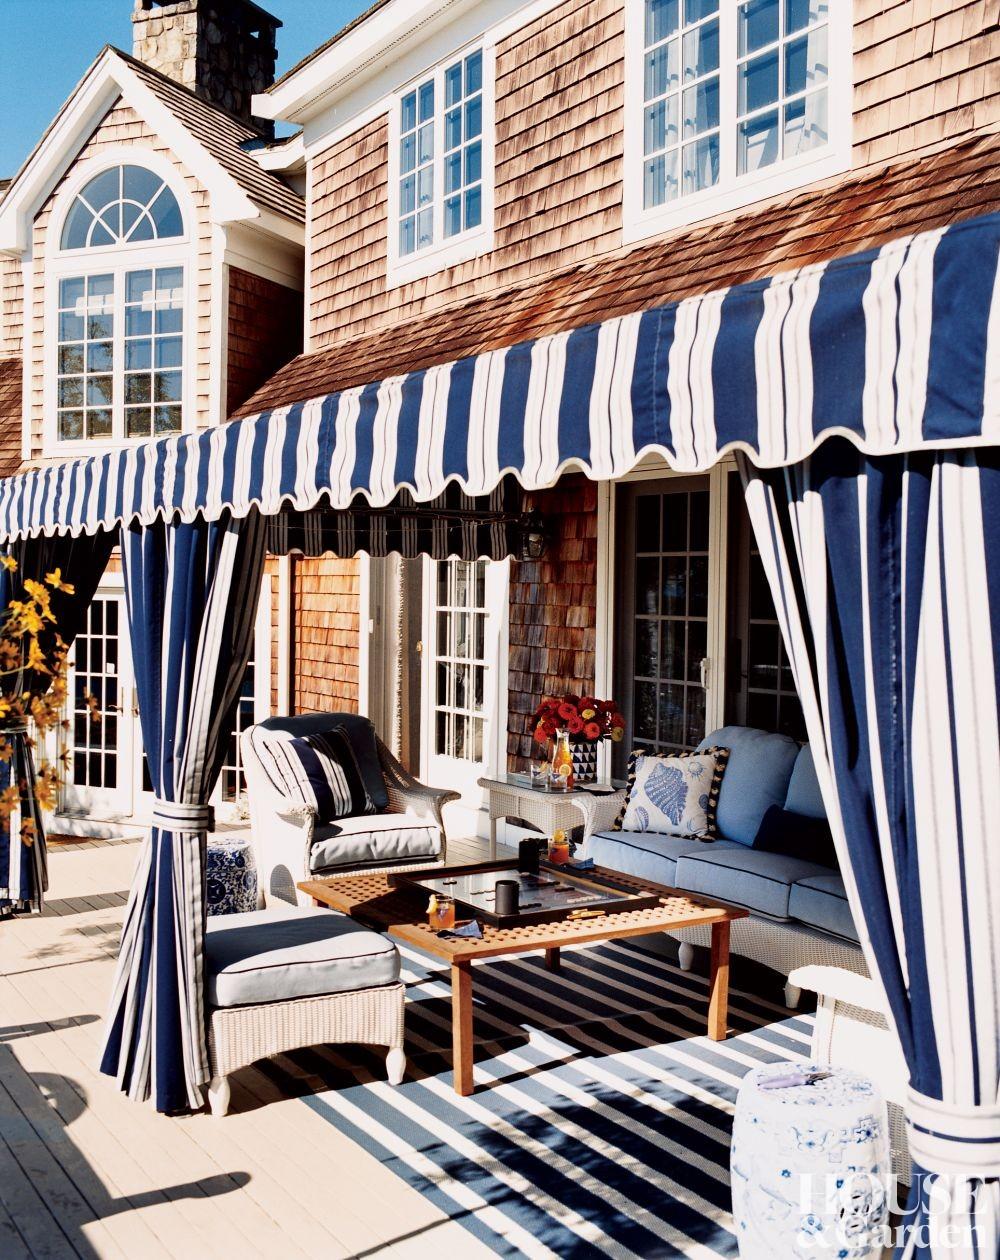 seaside beach theme patio decor ideas